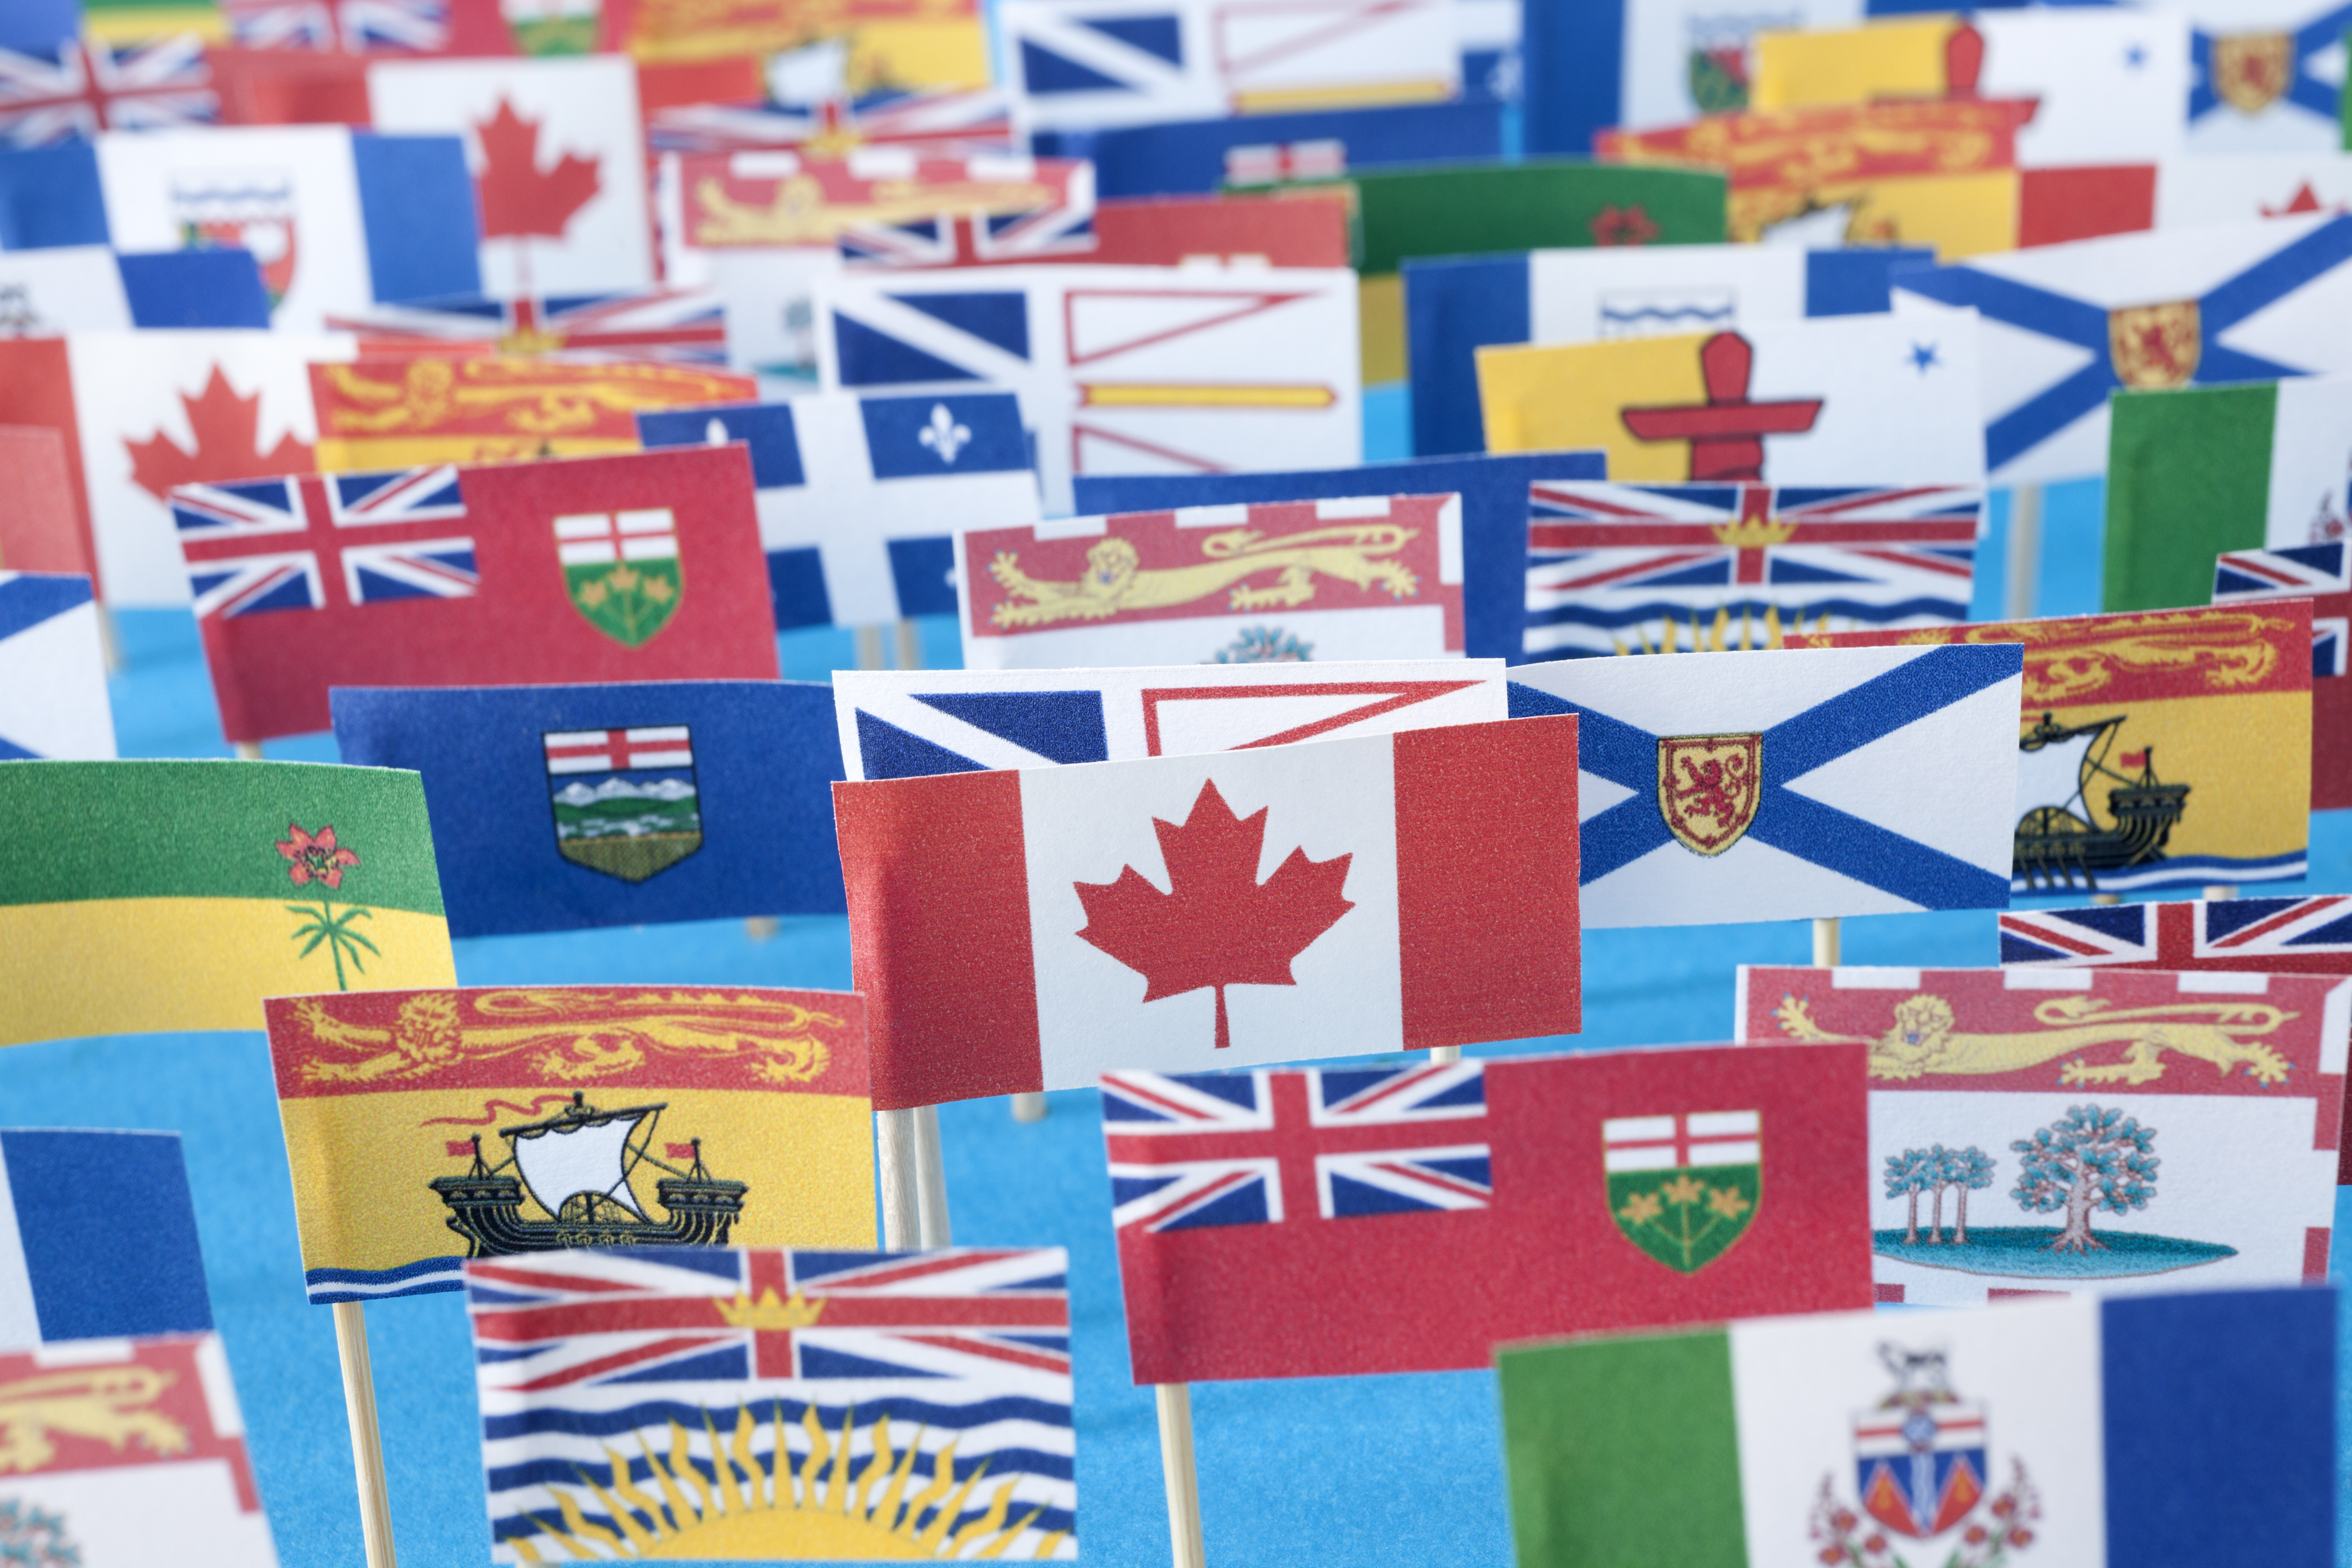 iStock-469022366_prov mini flags_2nd attempt